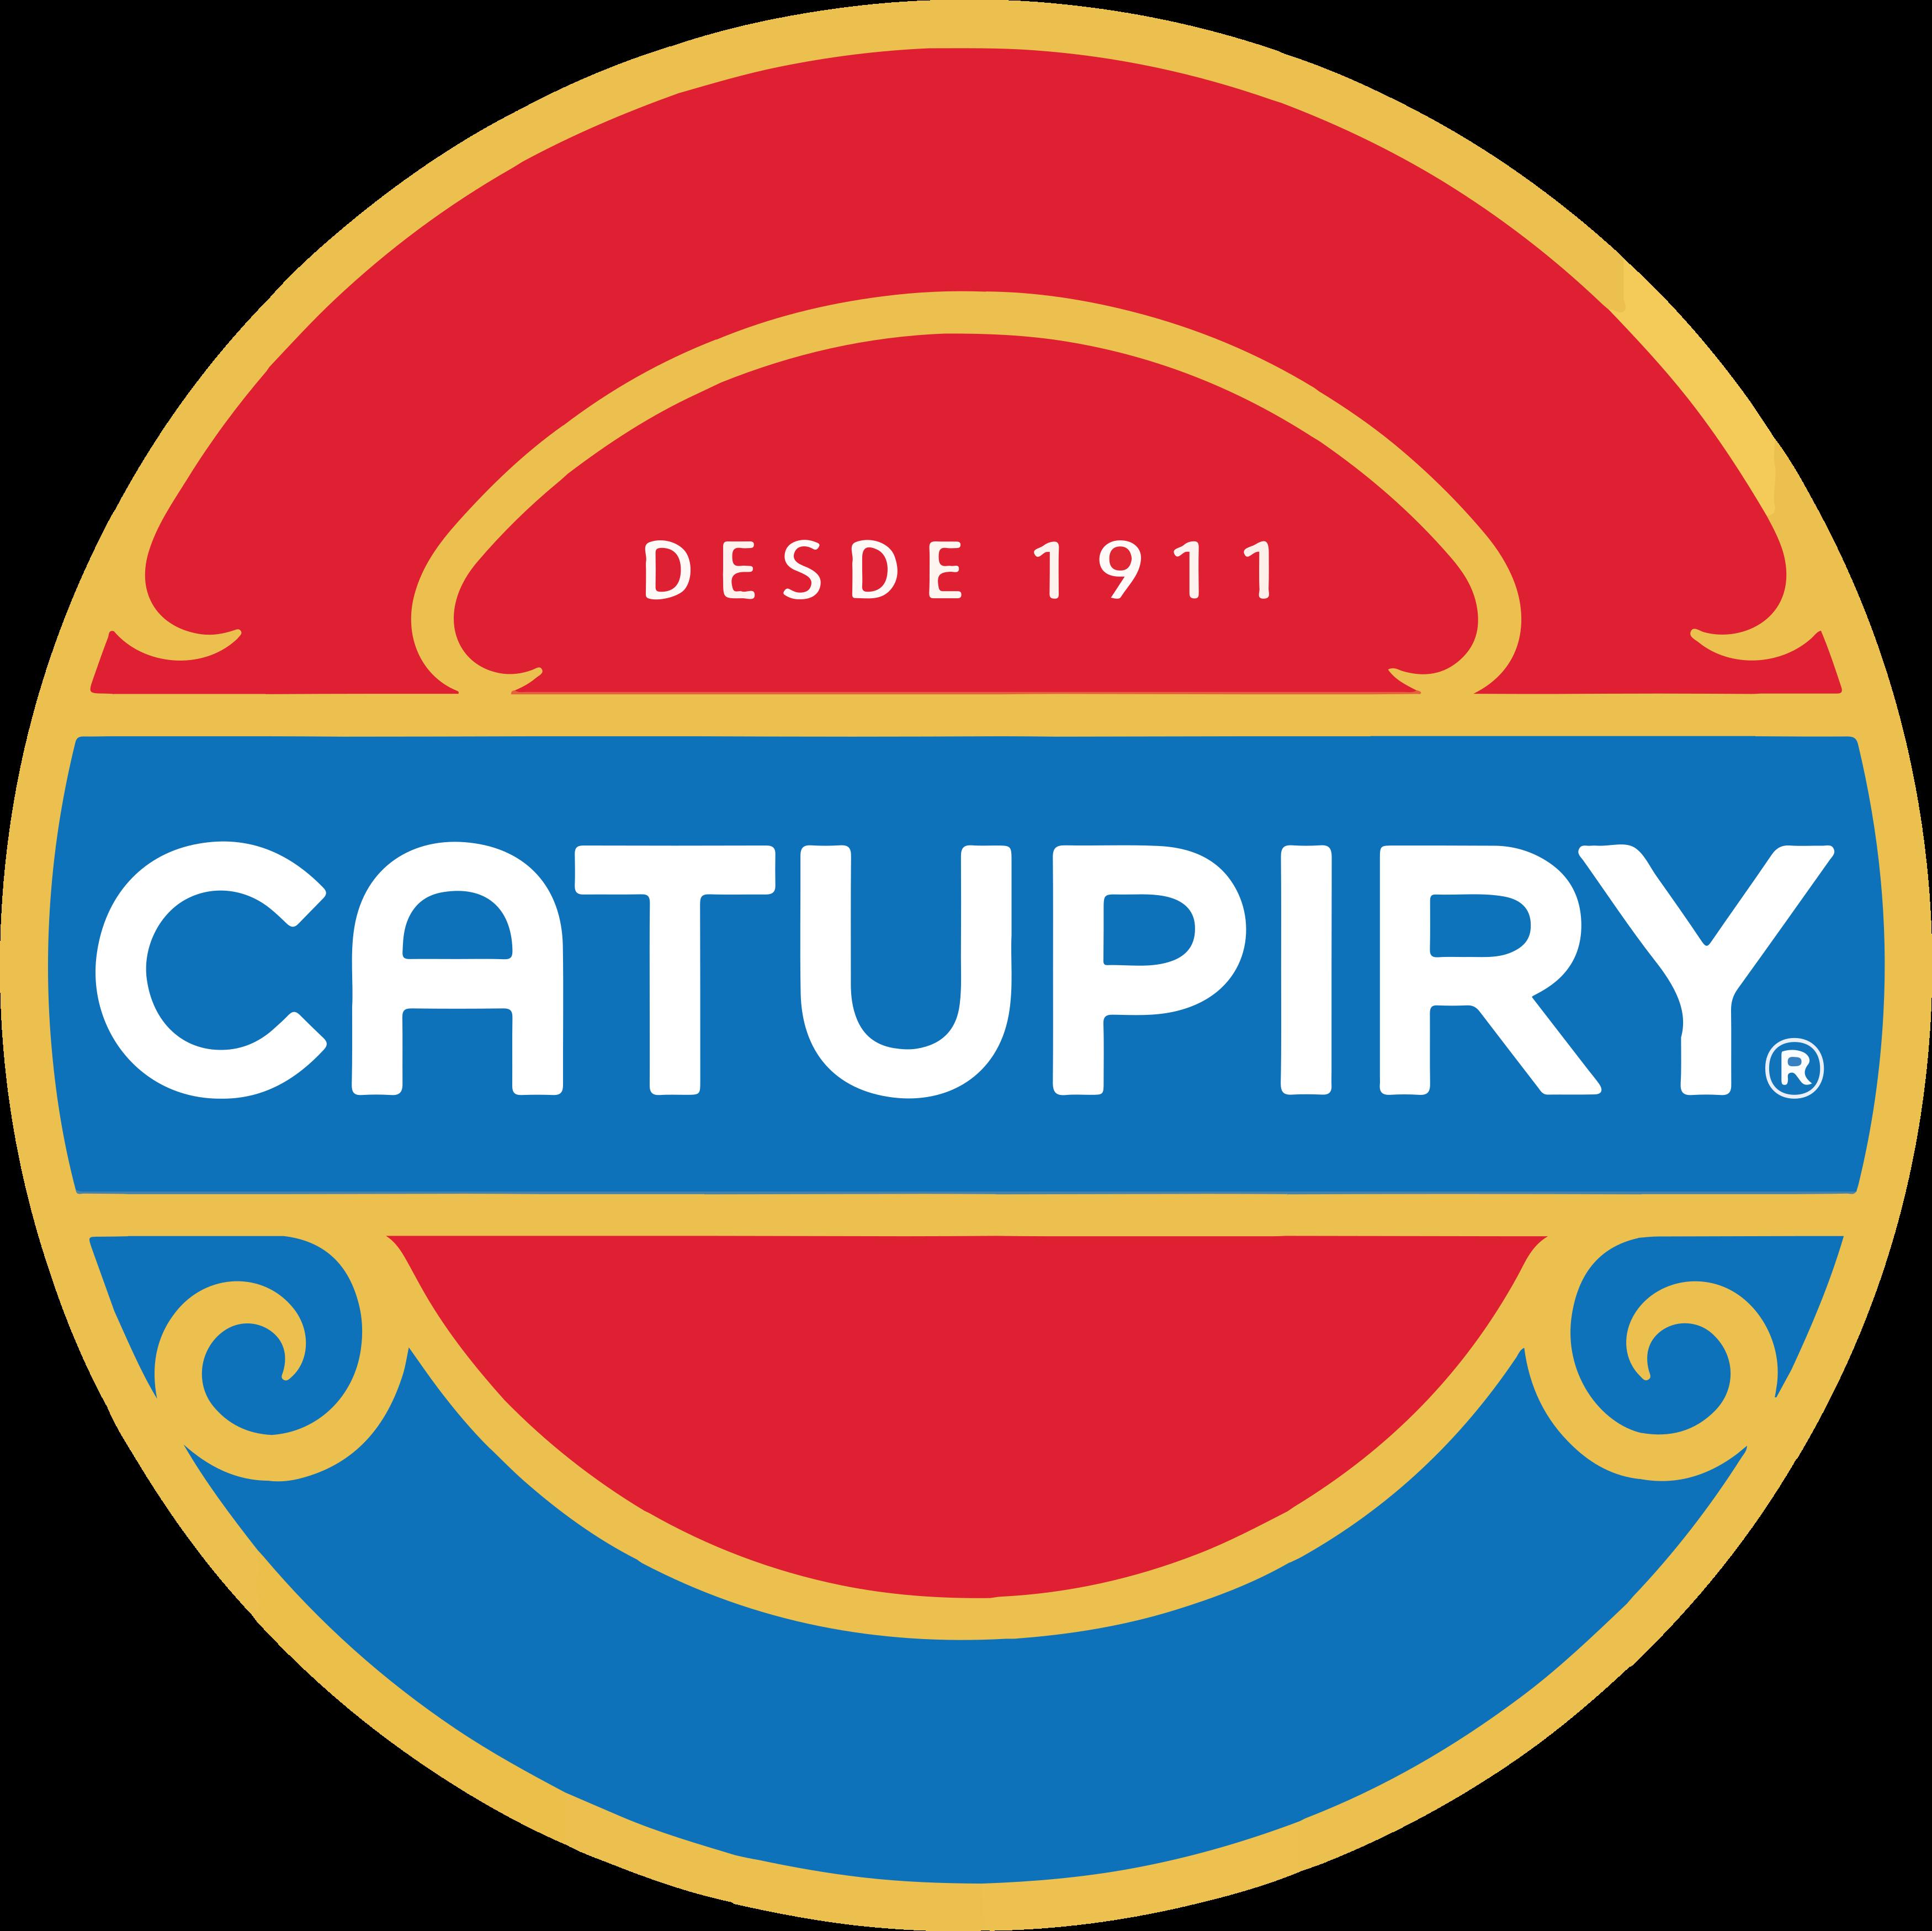 catupiry logo.